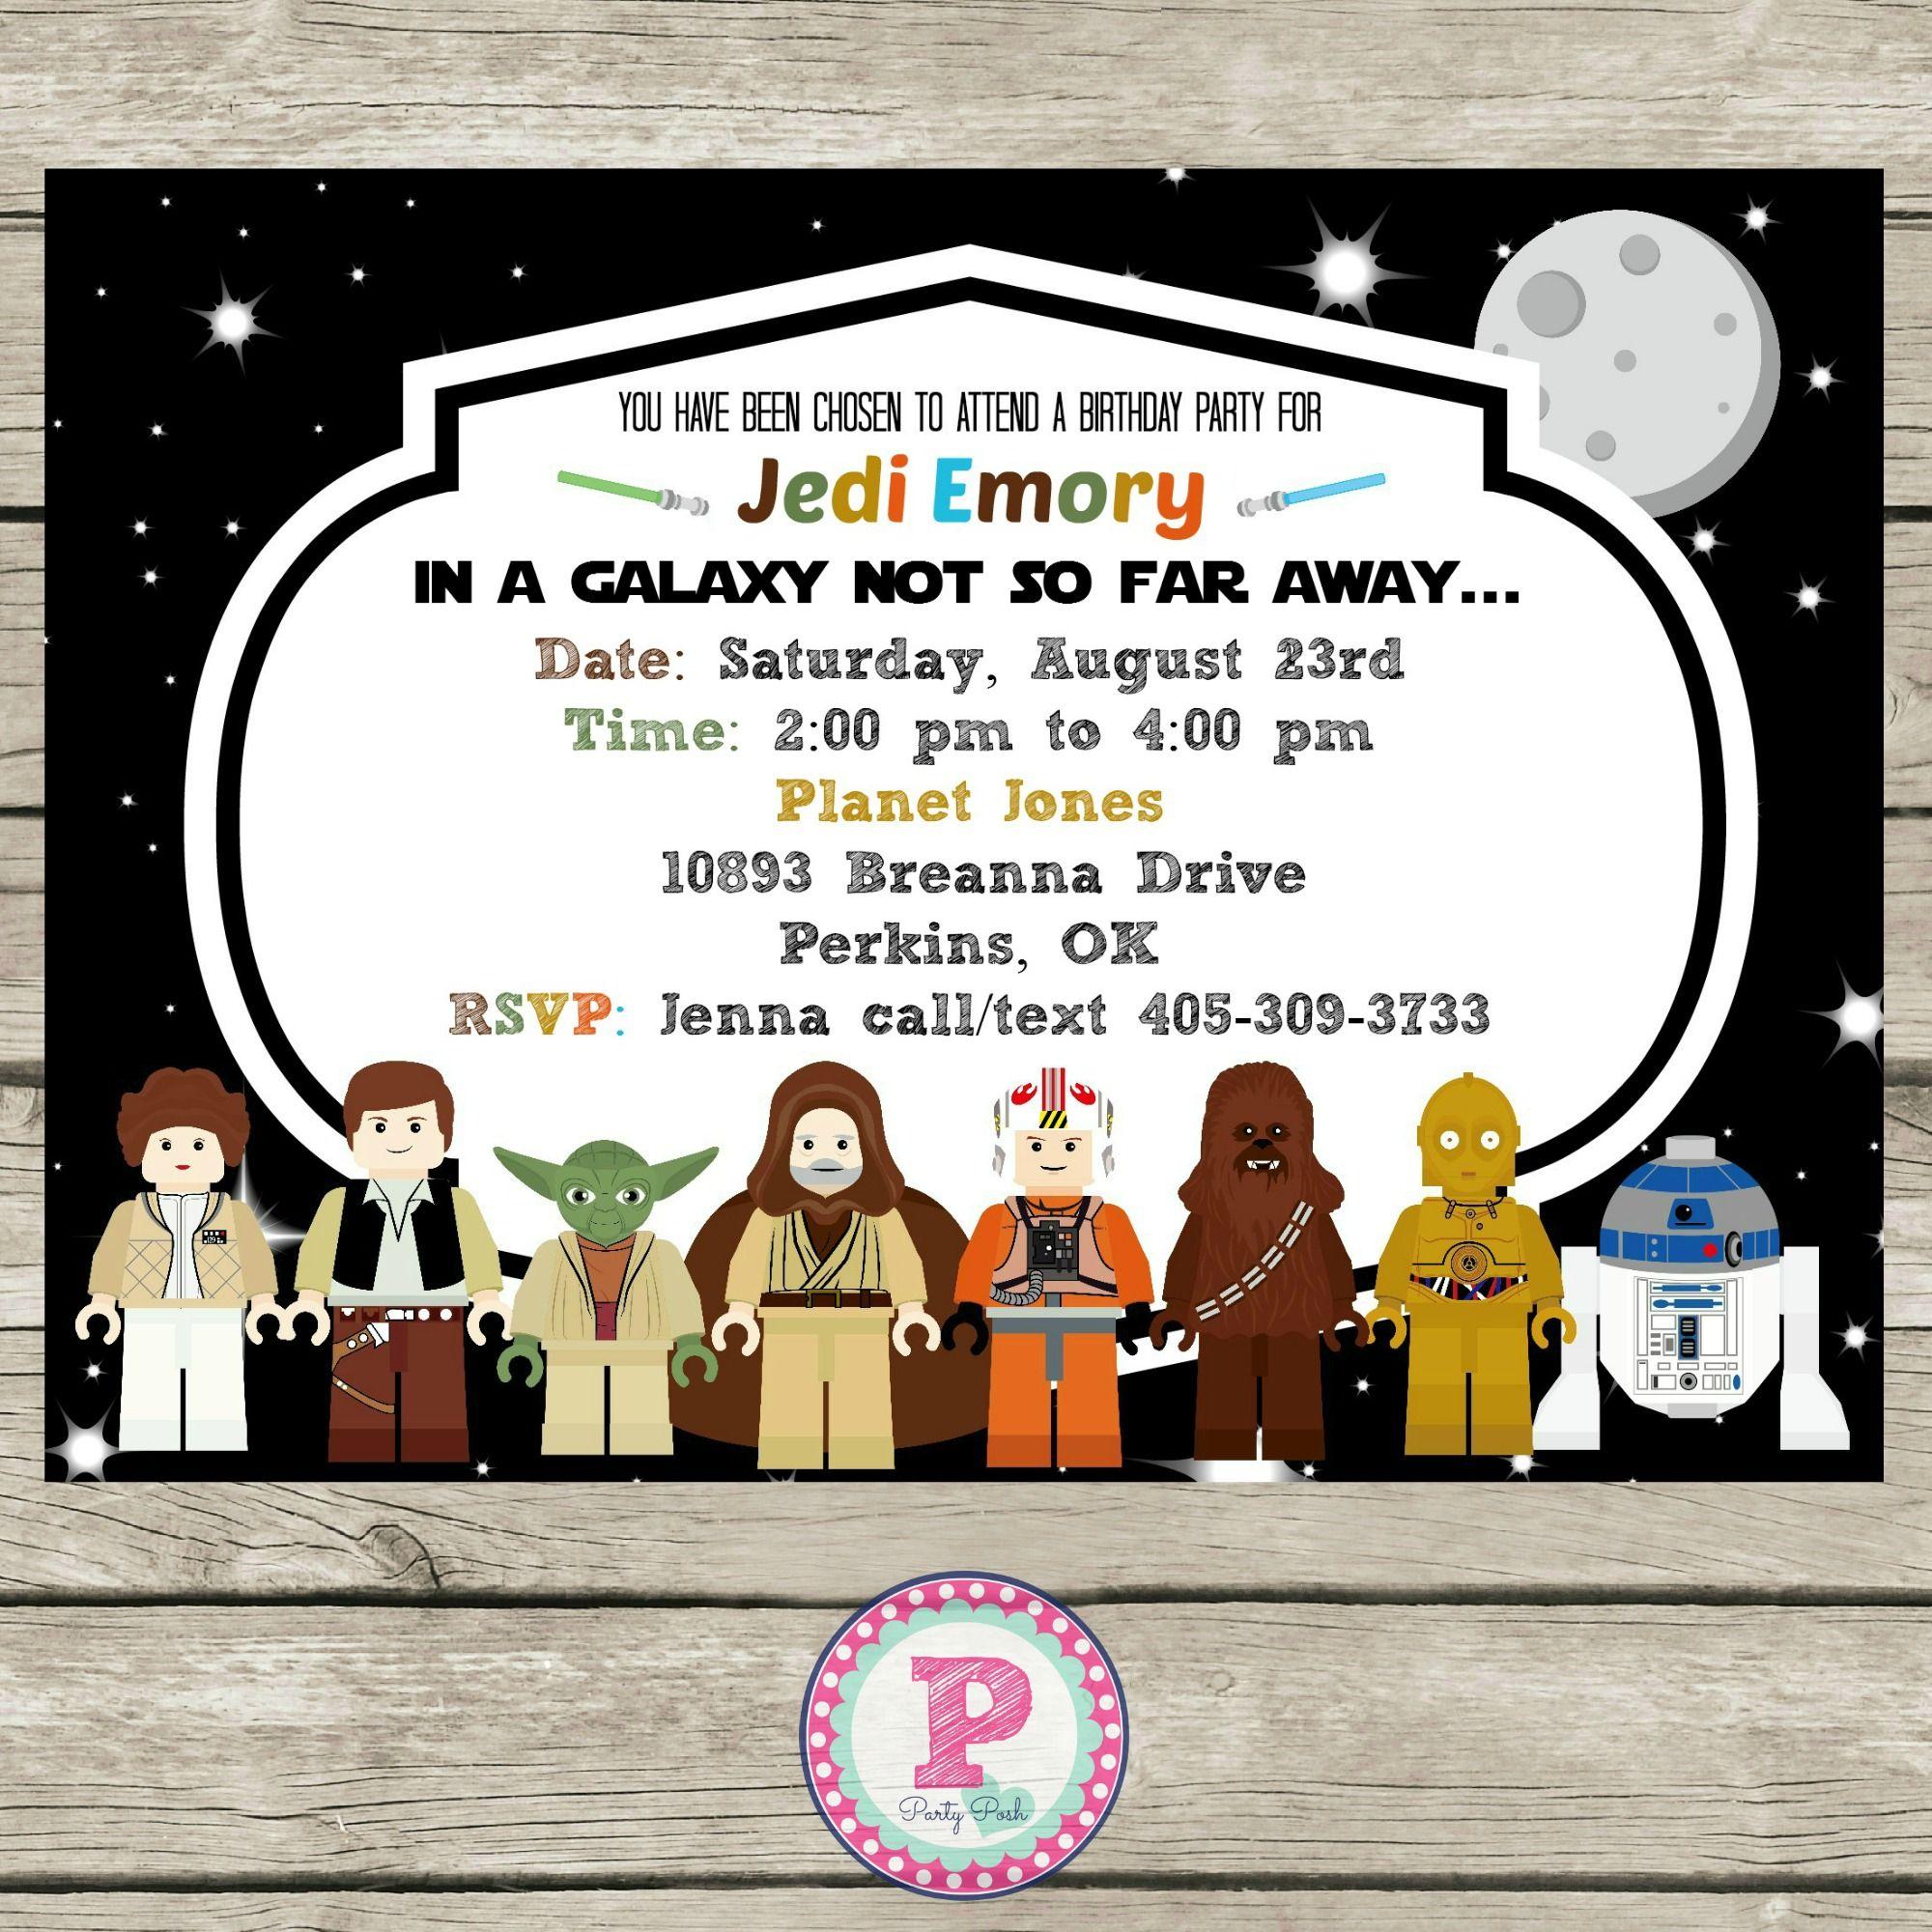 Lego Star Wars Invitation  Party Posh Printables  Star wars